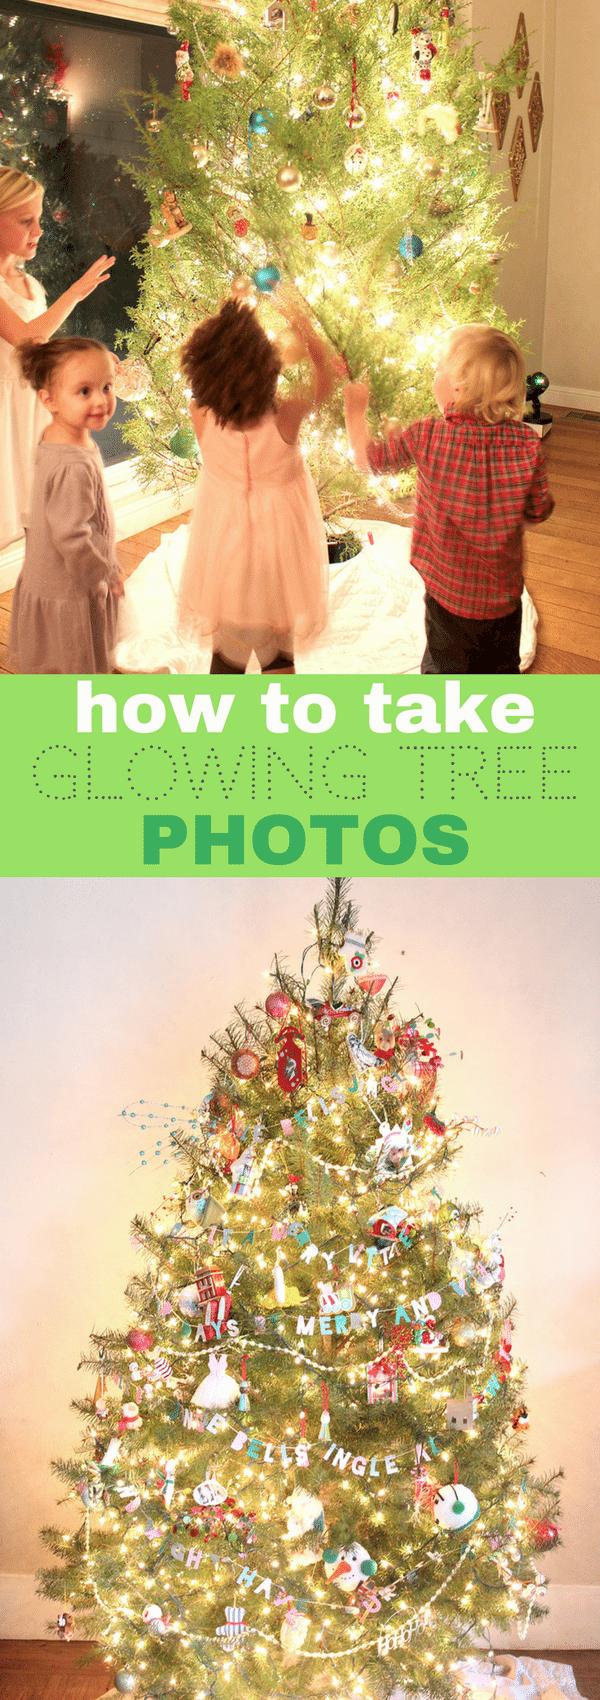 Photography: Amazing Nighttime Christmas Tree Photos - TINSELBOX